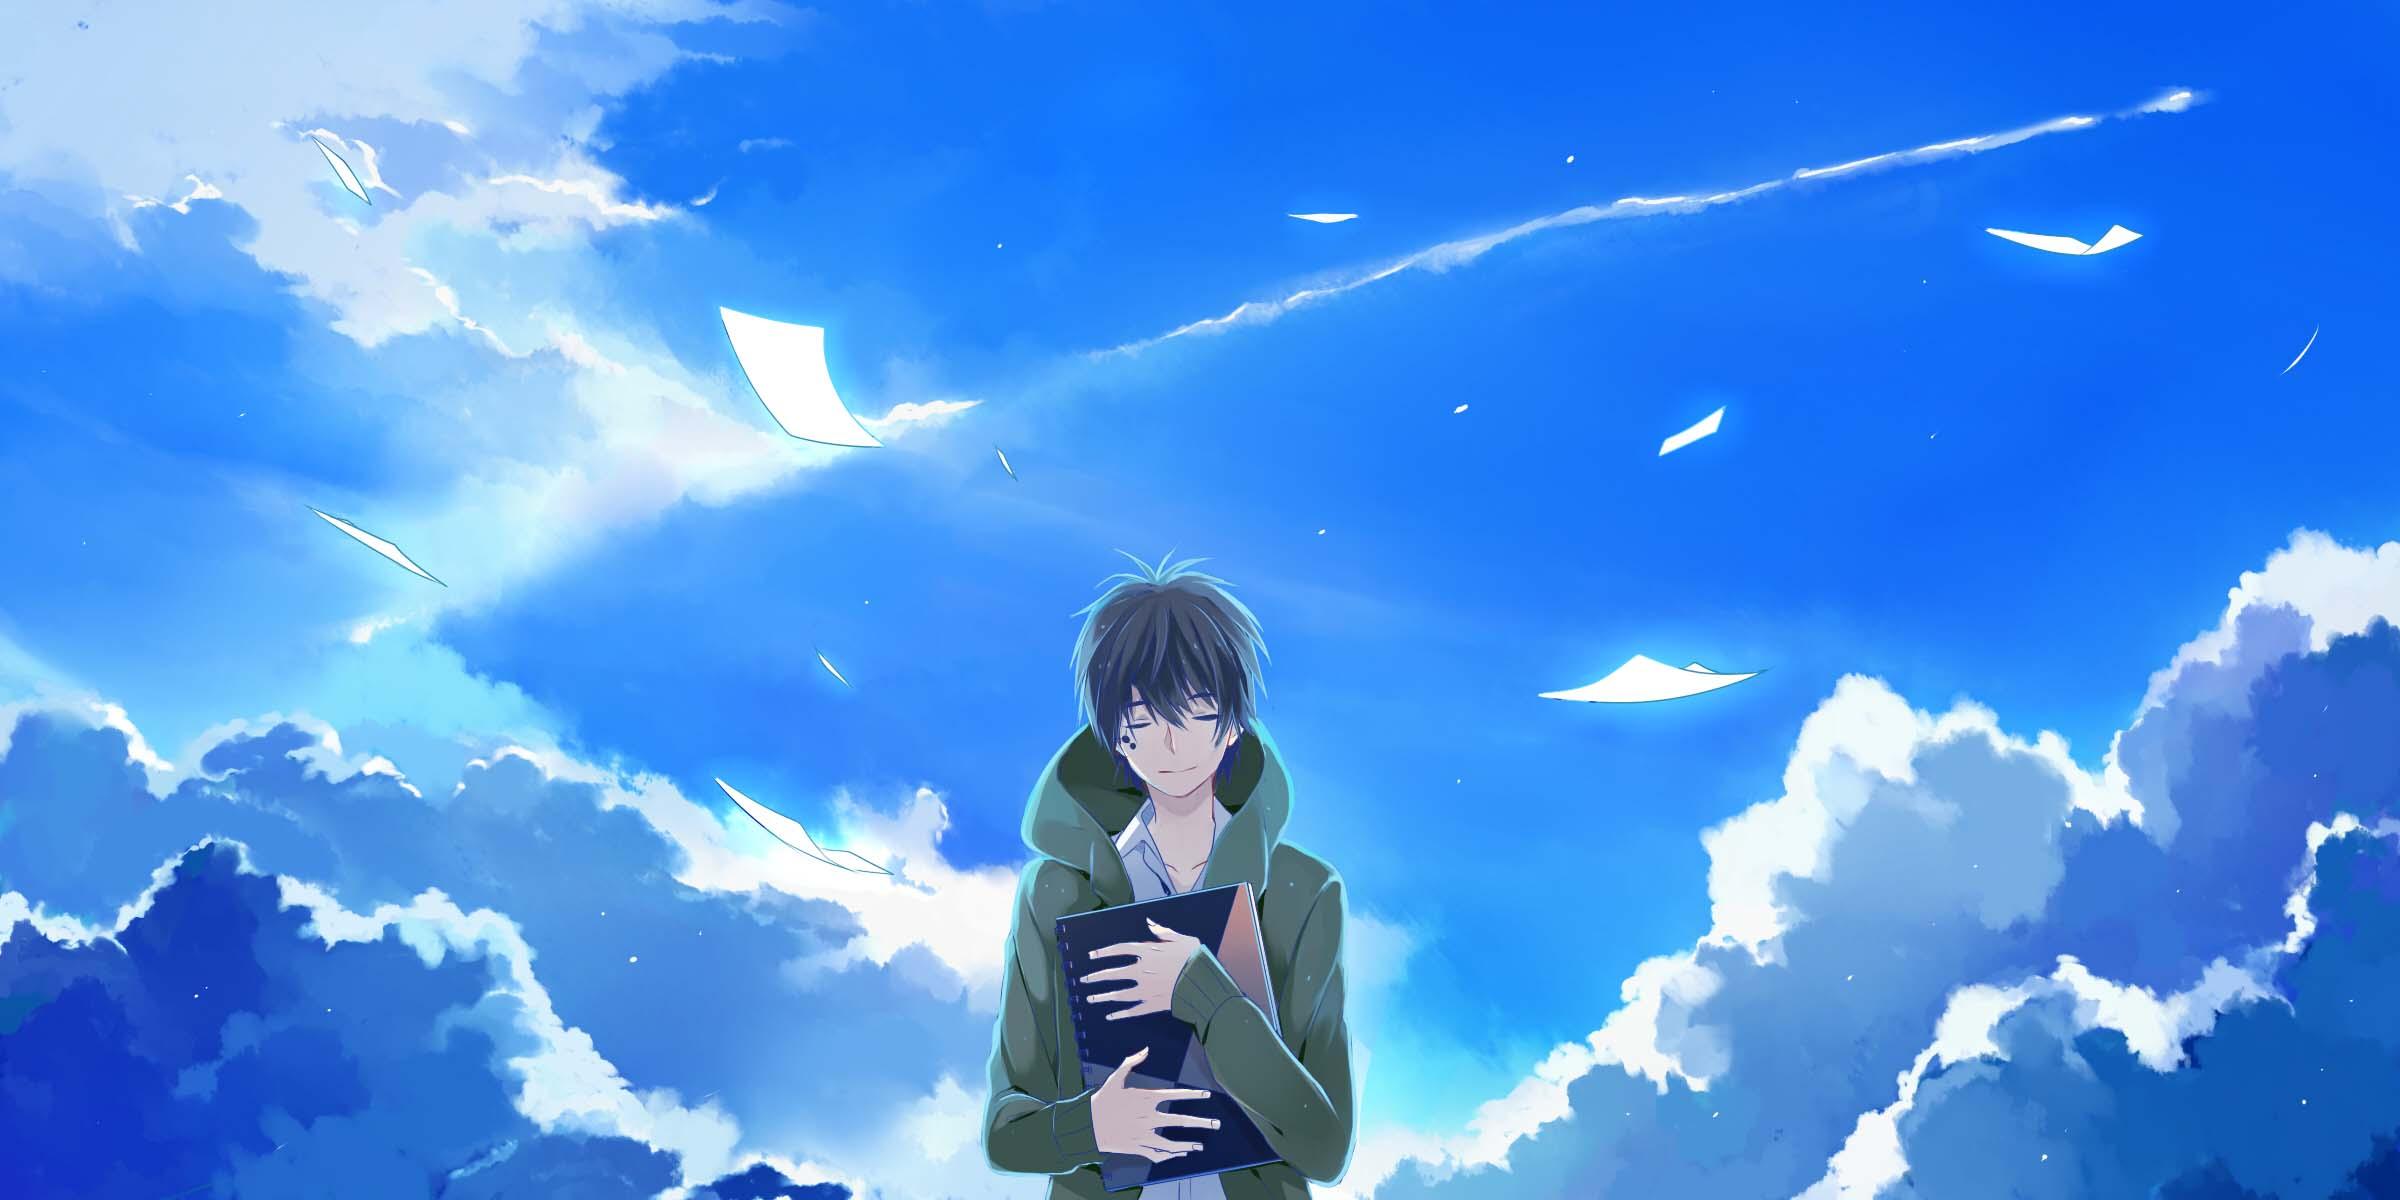 Anime wallpaper hd cute